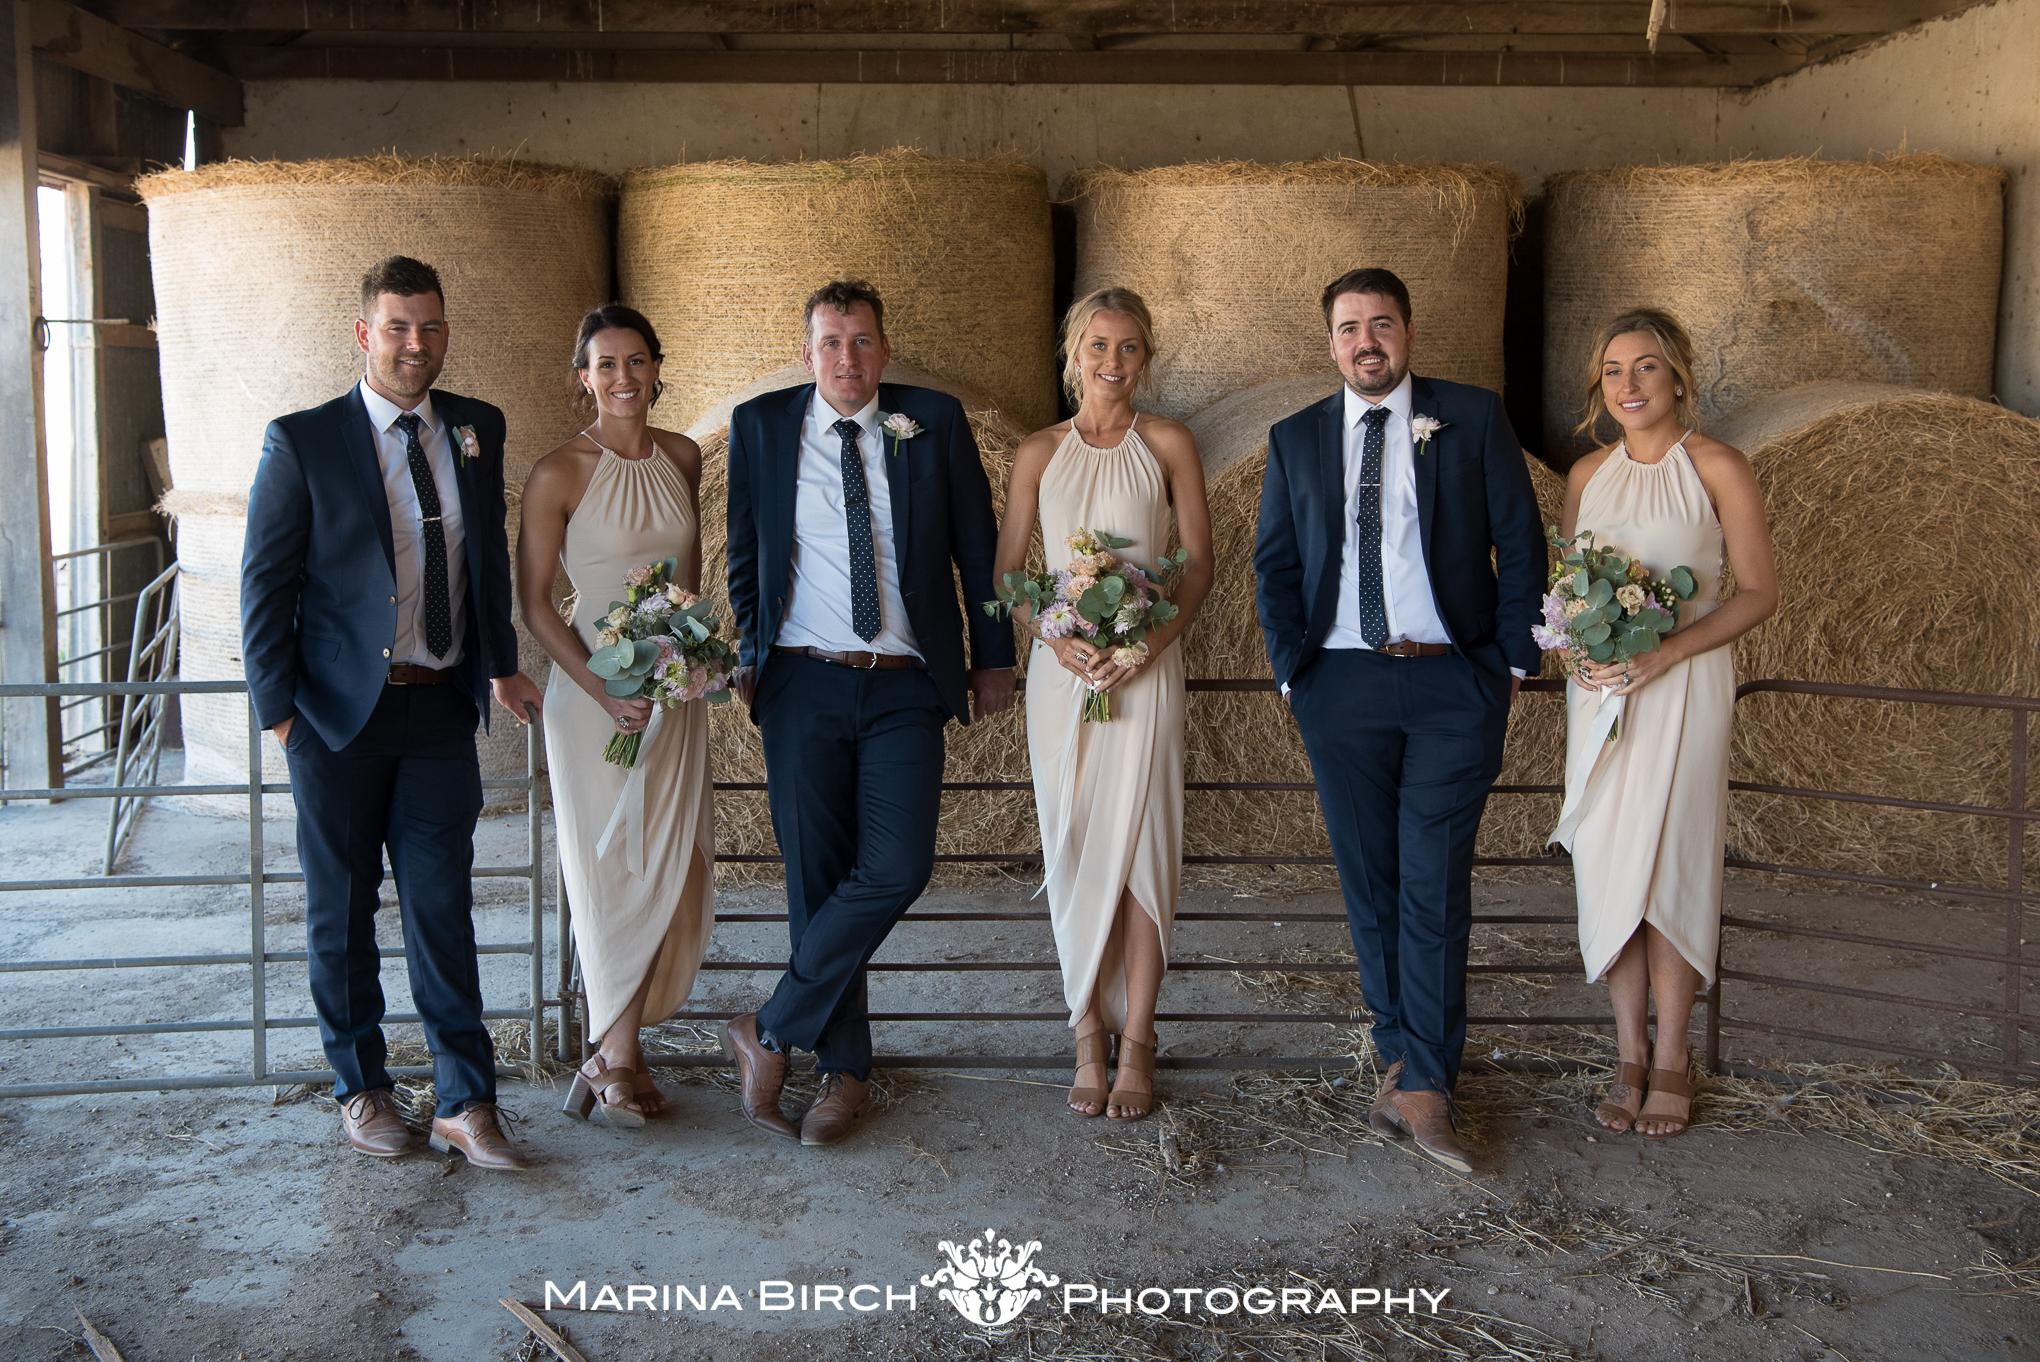 MBP.Parson's wedding-22.jpg